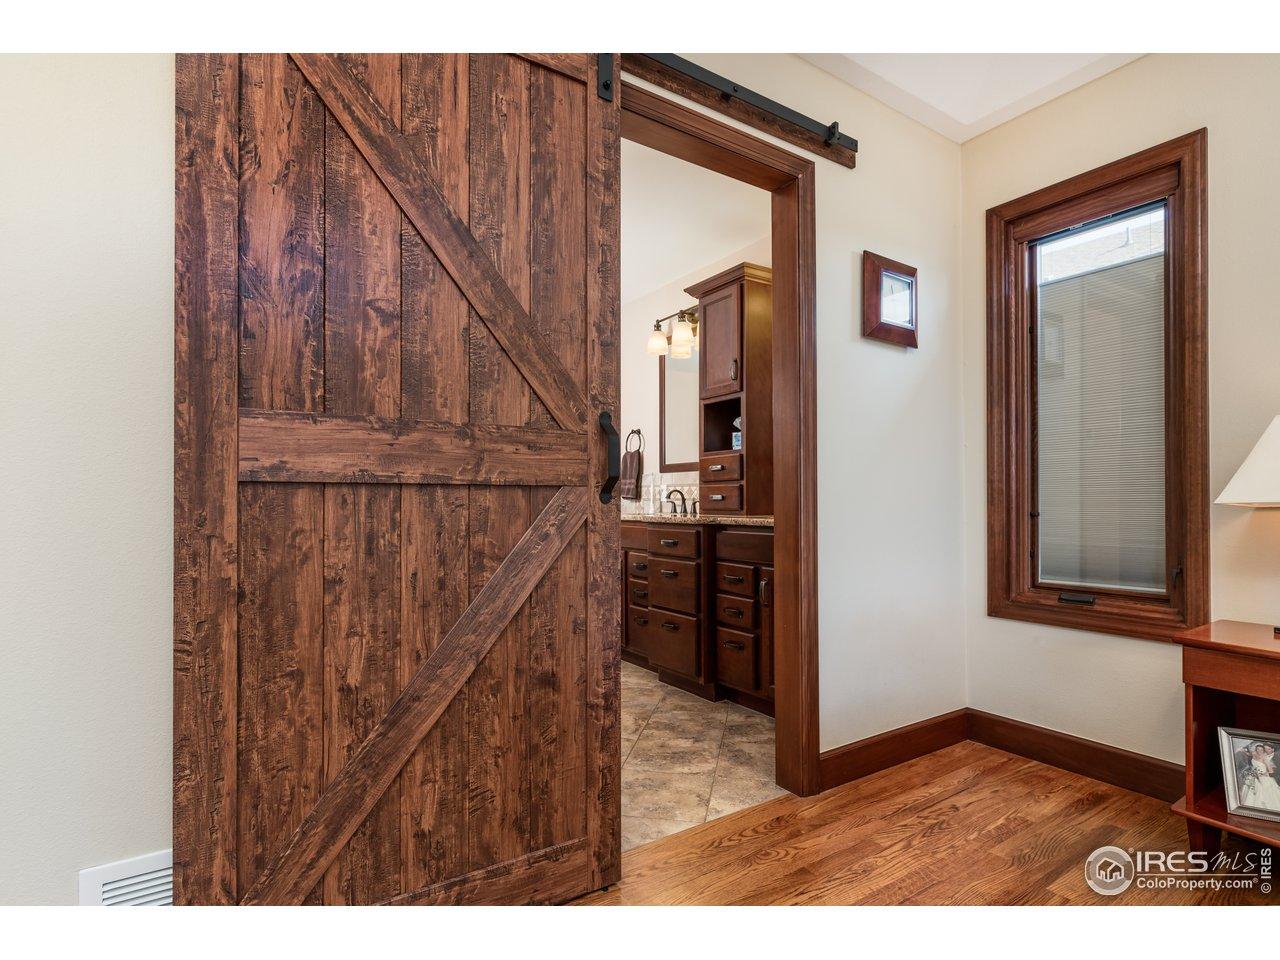 Master Bath with Great Barn Door!